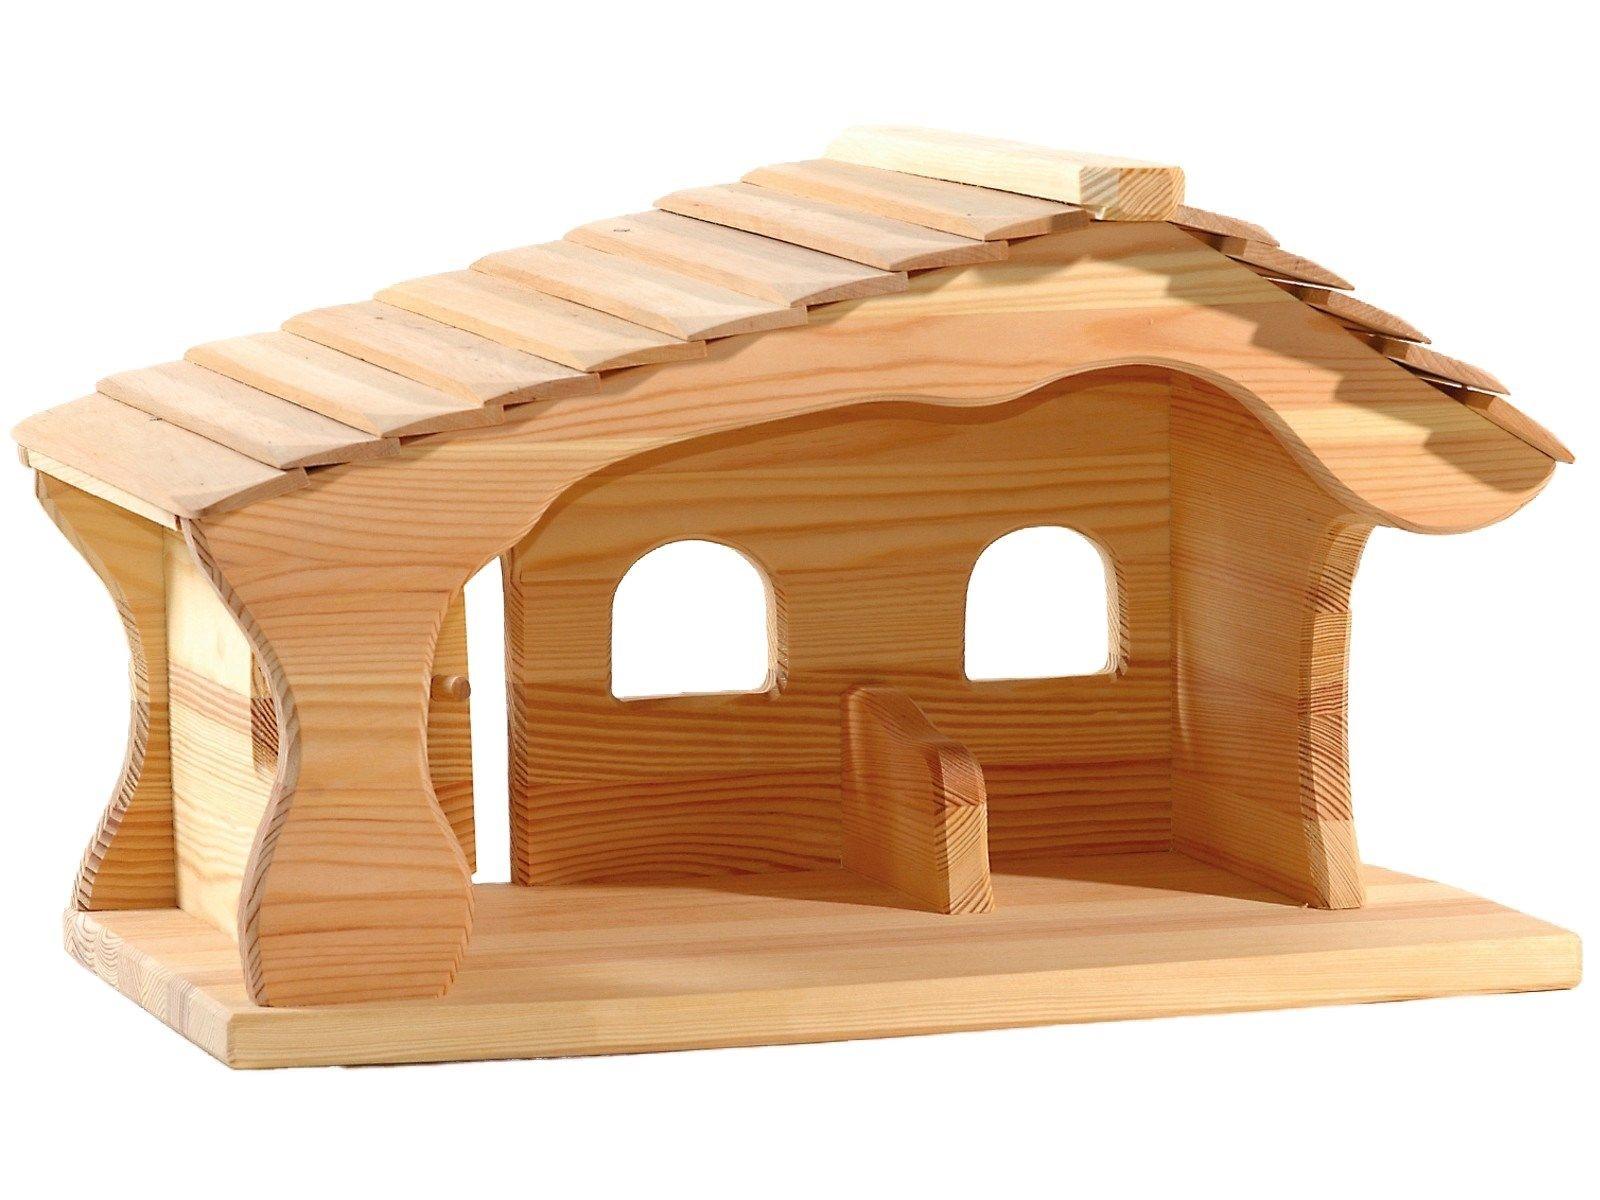 ostheimer weihnachtskrippe krippenstall aus massivholz bio ge lt ma e 47 x 30 x 30 cm. Black Bedroom Furniture Sets. Home Design Ideas